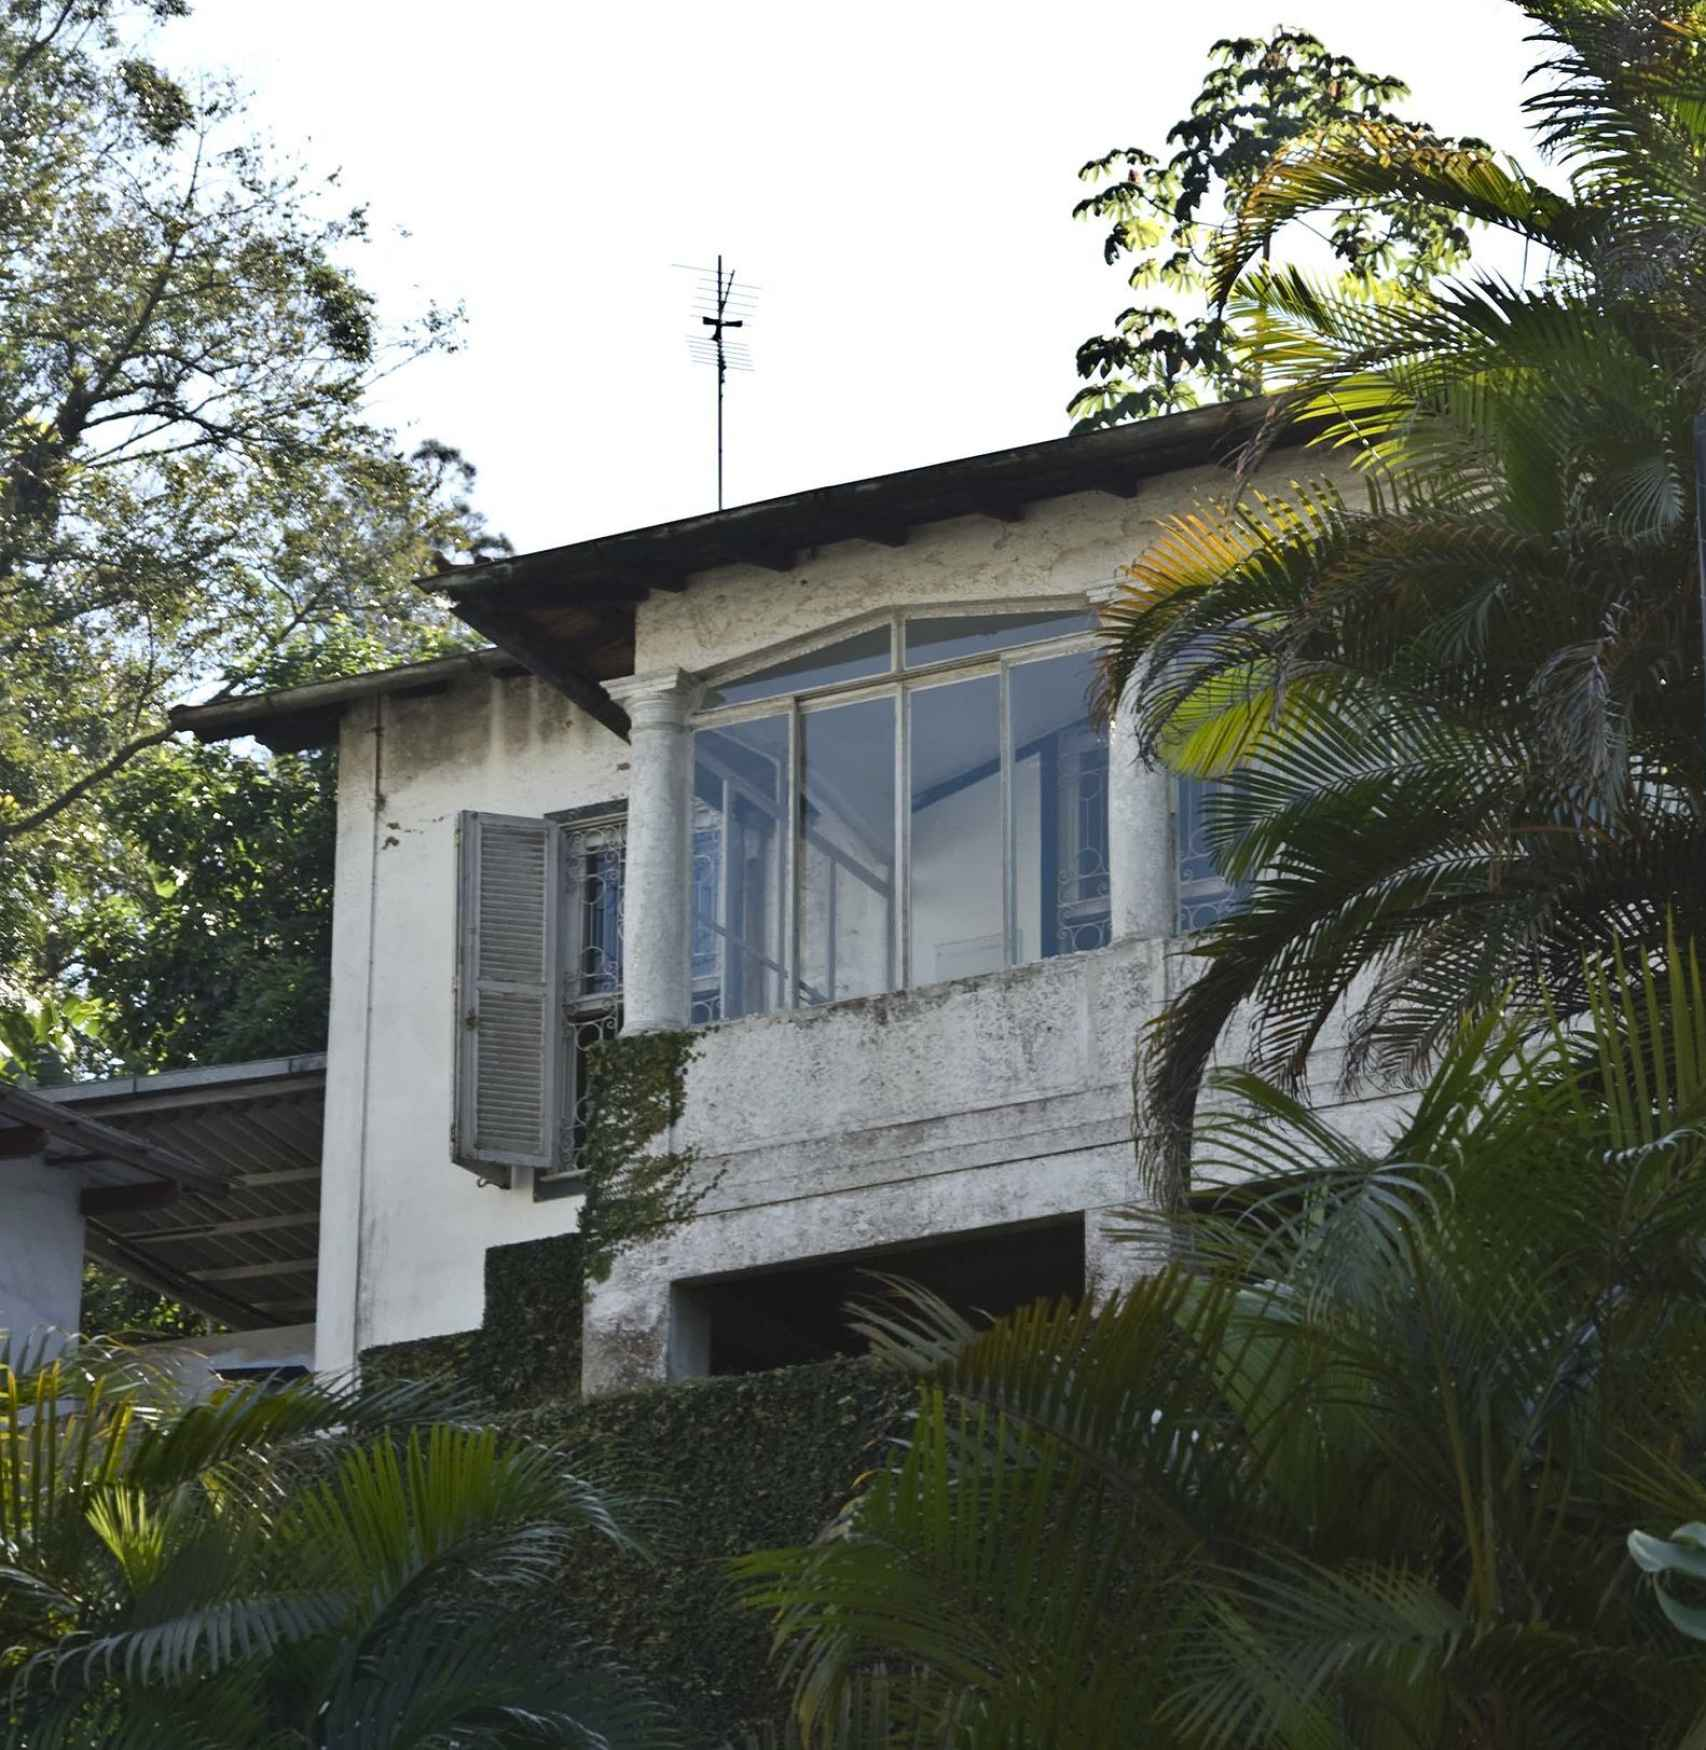 El último hogar del escritor en Petrópolis